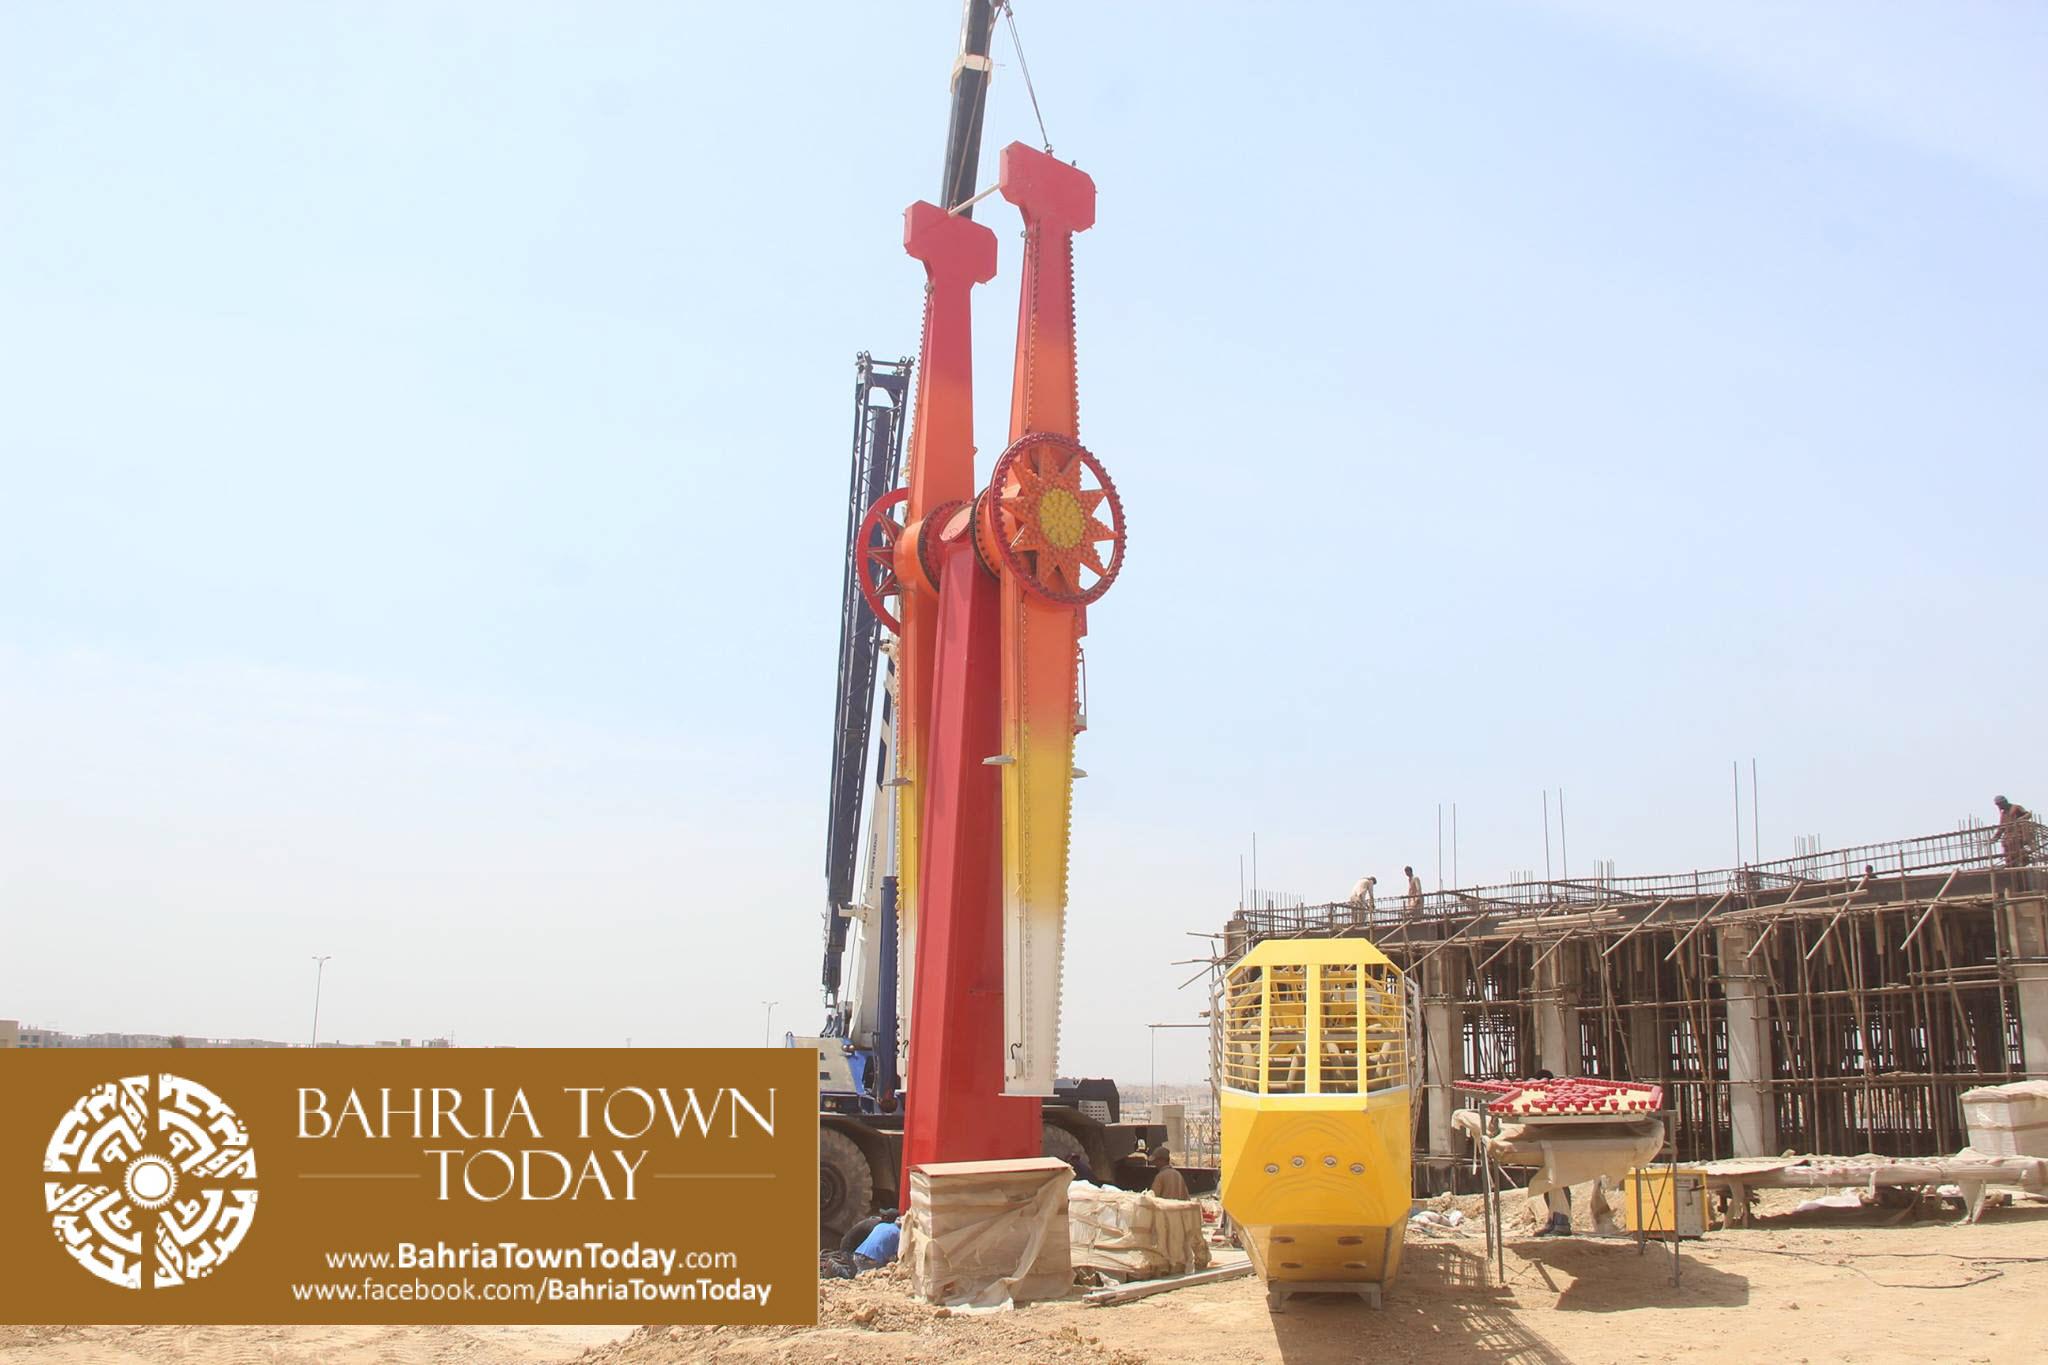 Bahria Adventura Theme Park Karachi Latest Progress Update – April 2016 (2)